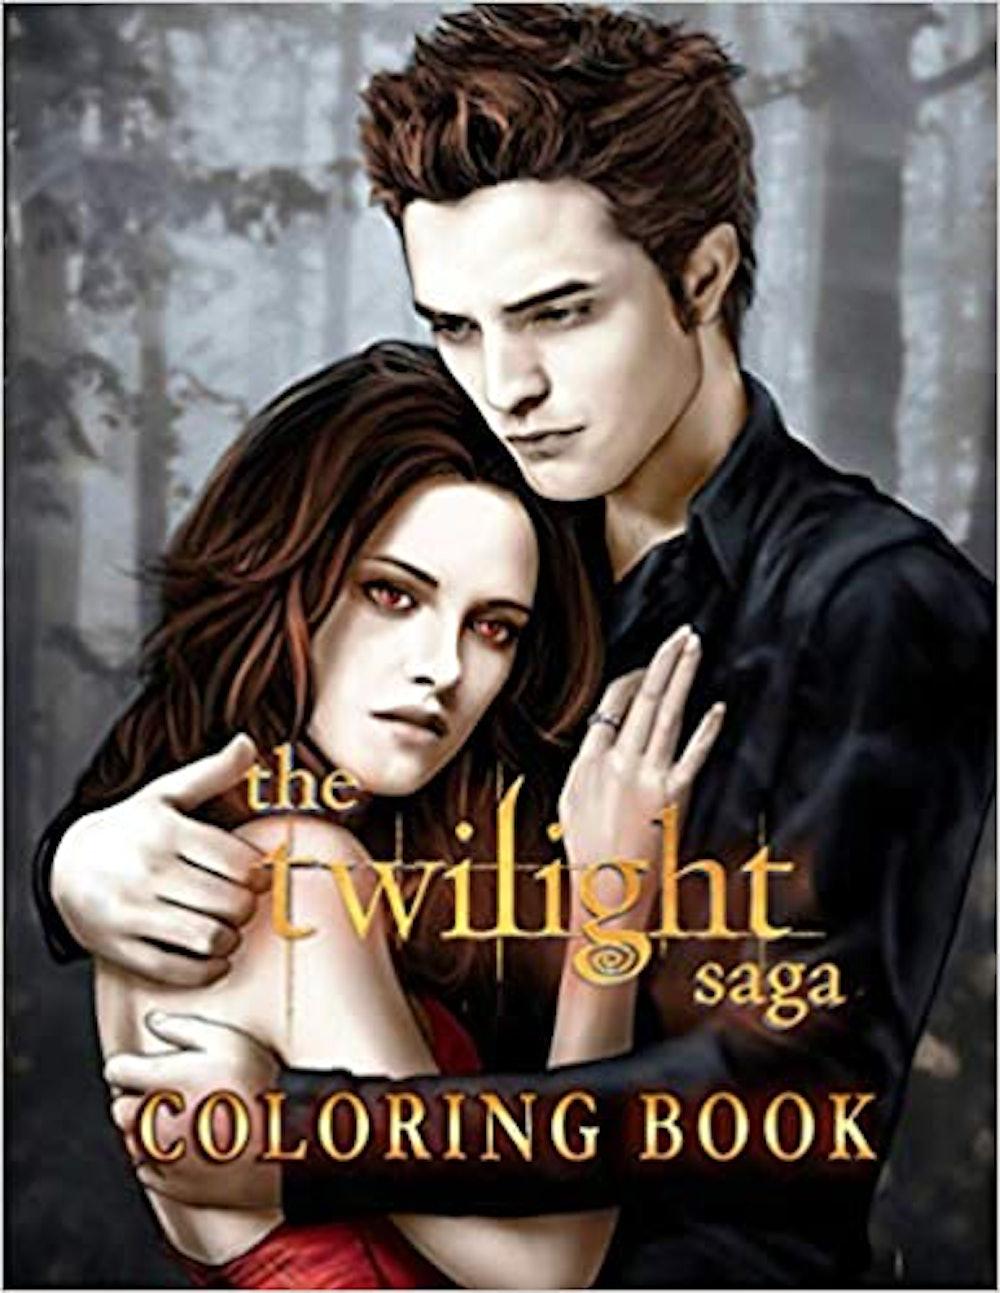 The Twilight Saga Coloring Book